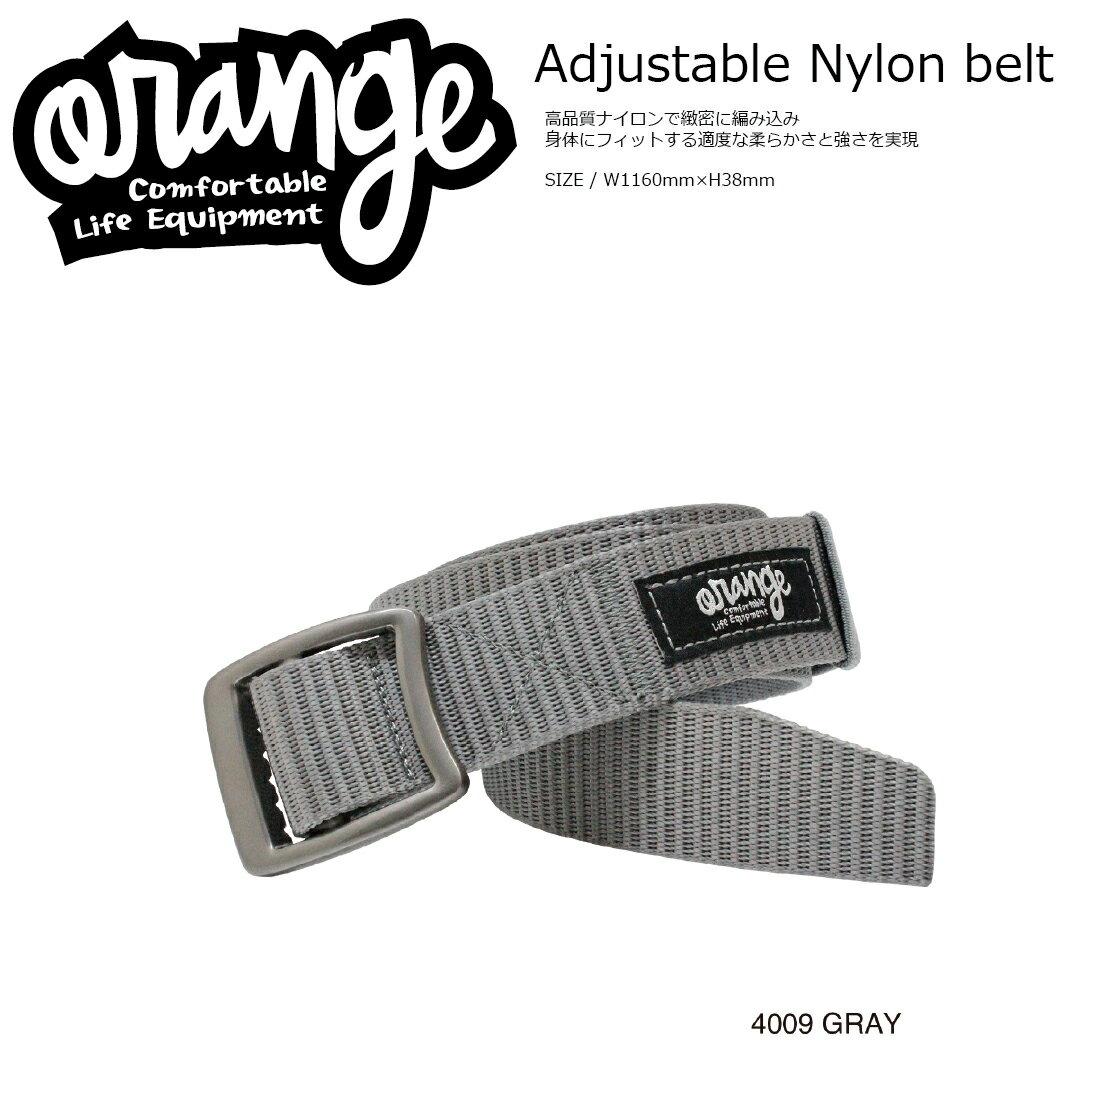 Oran'ge Adjustable Belt 4009 GRAY 編み込みベルト ナイロンベルト2017 2017-18